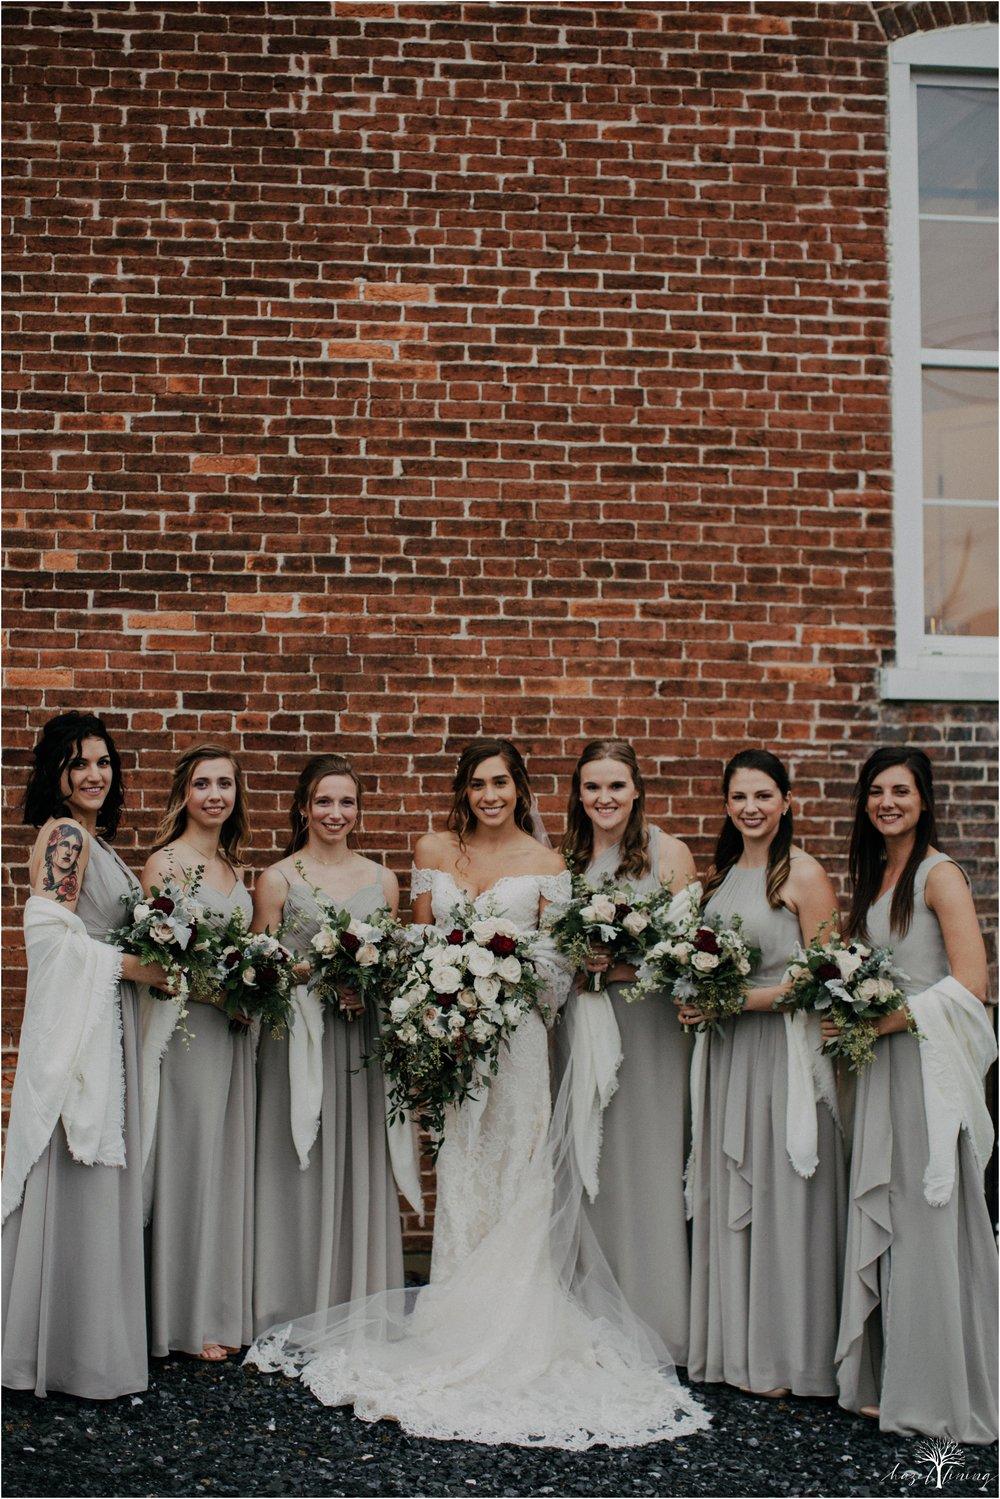 emma-matt-gehringer-the-booking-house-lancaster-manhiem-pennsylvania-winter-wedding_0075.jpg